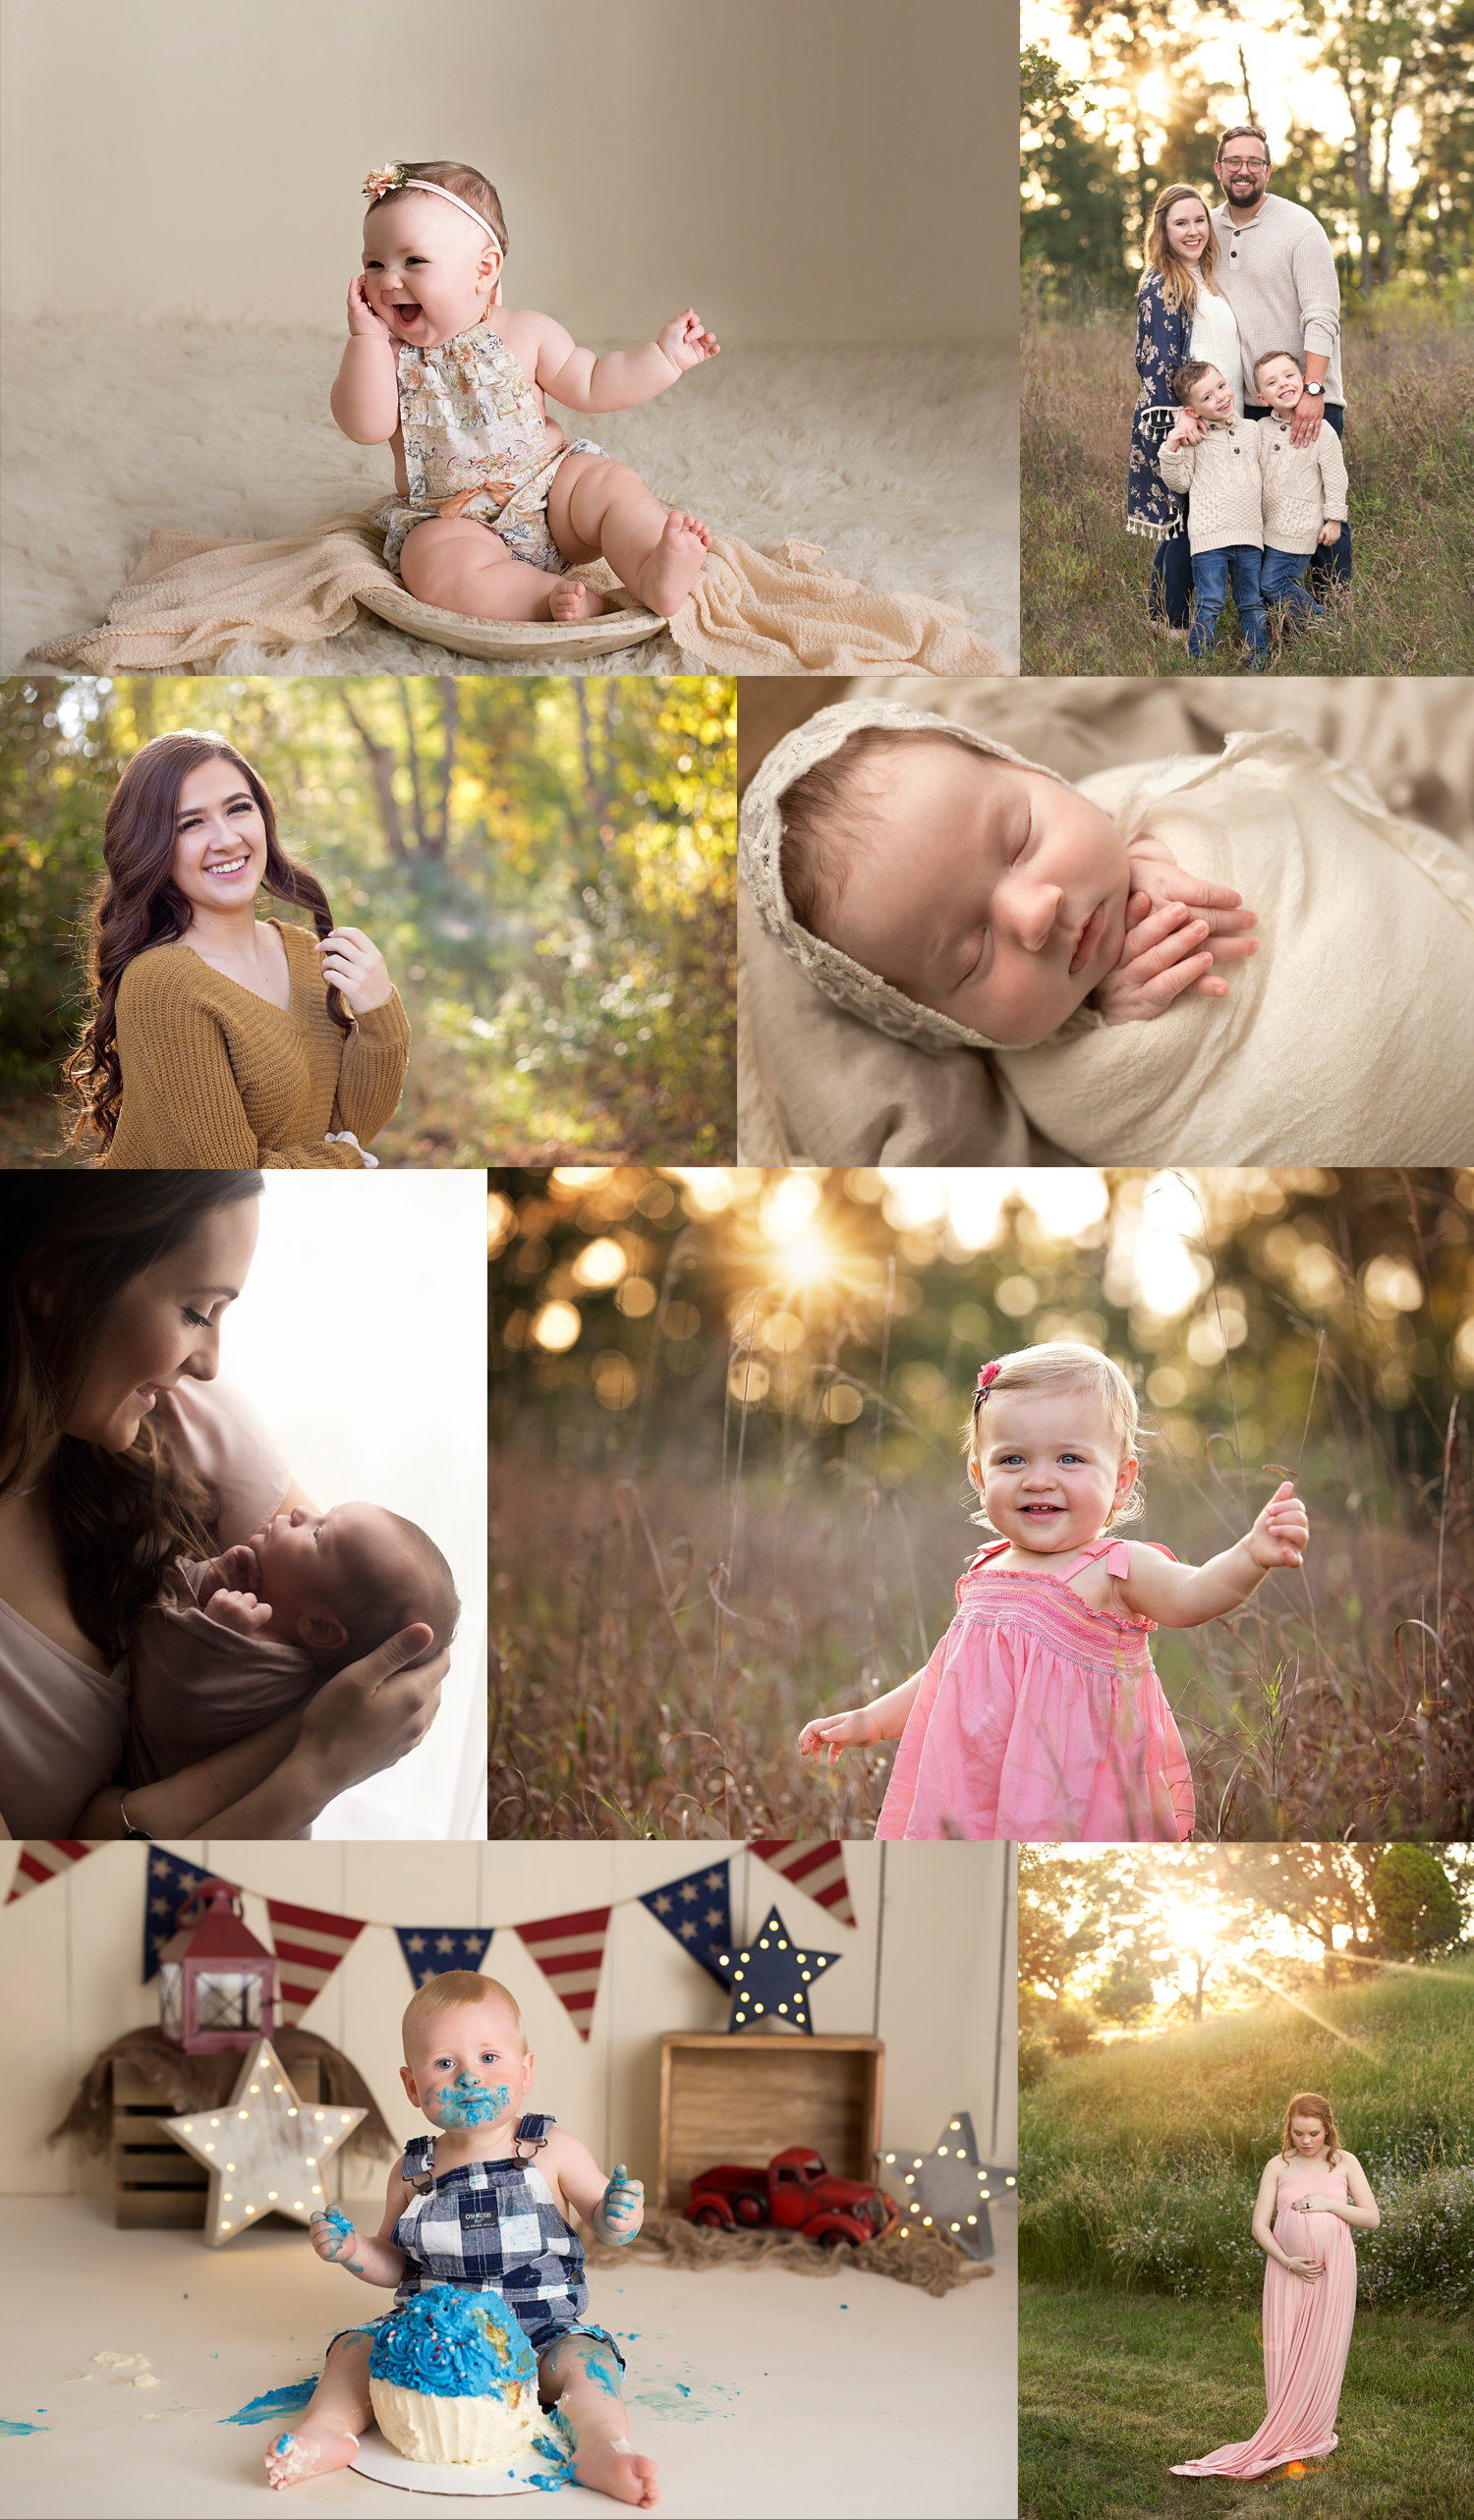 b0389a247c90e Howell/Brighton Michigan Photographer { Newborn & Family }